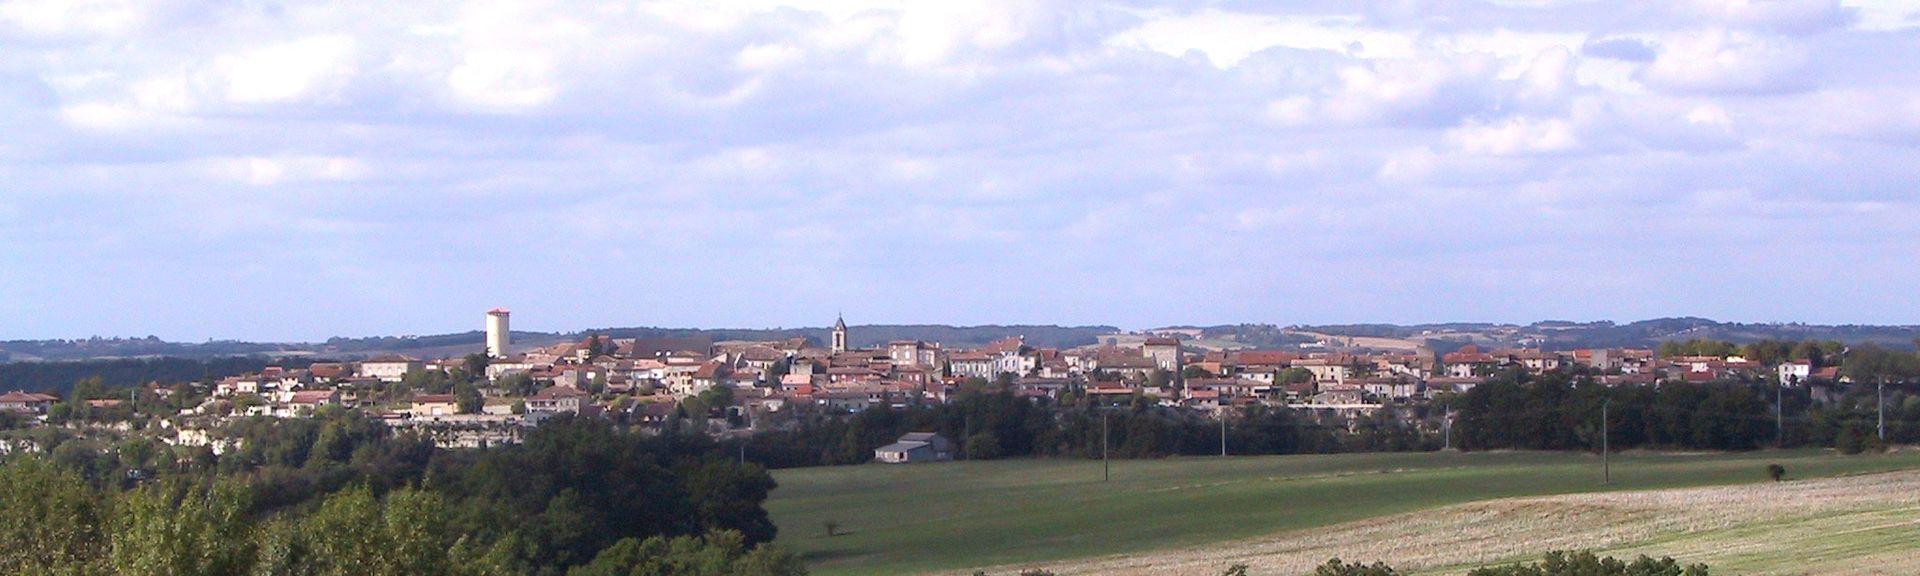 Cauzac, France